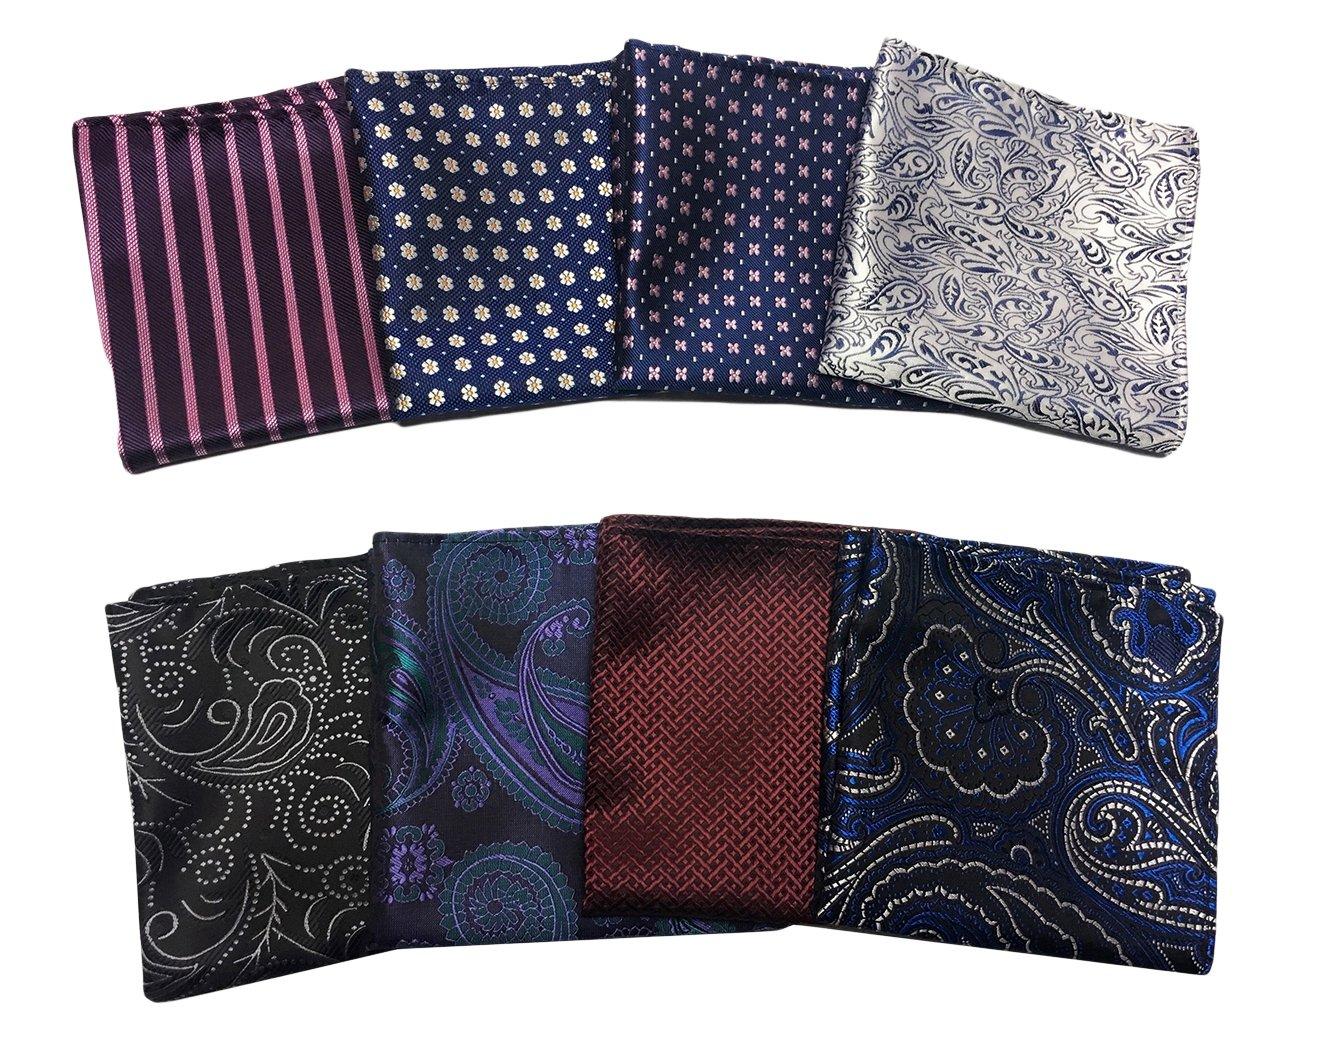 MENDENG Men's 8 Pack Mixed Paisley Floral Pocket Square Wedding Handkerchief